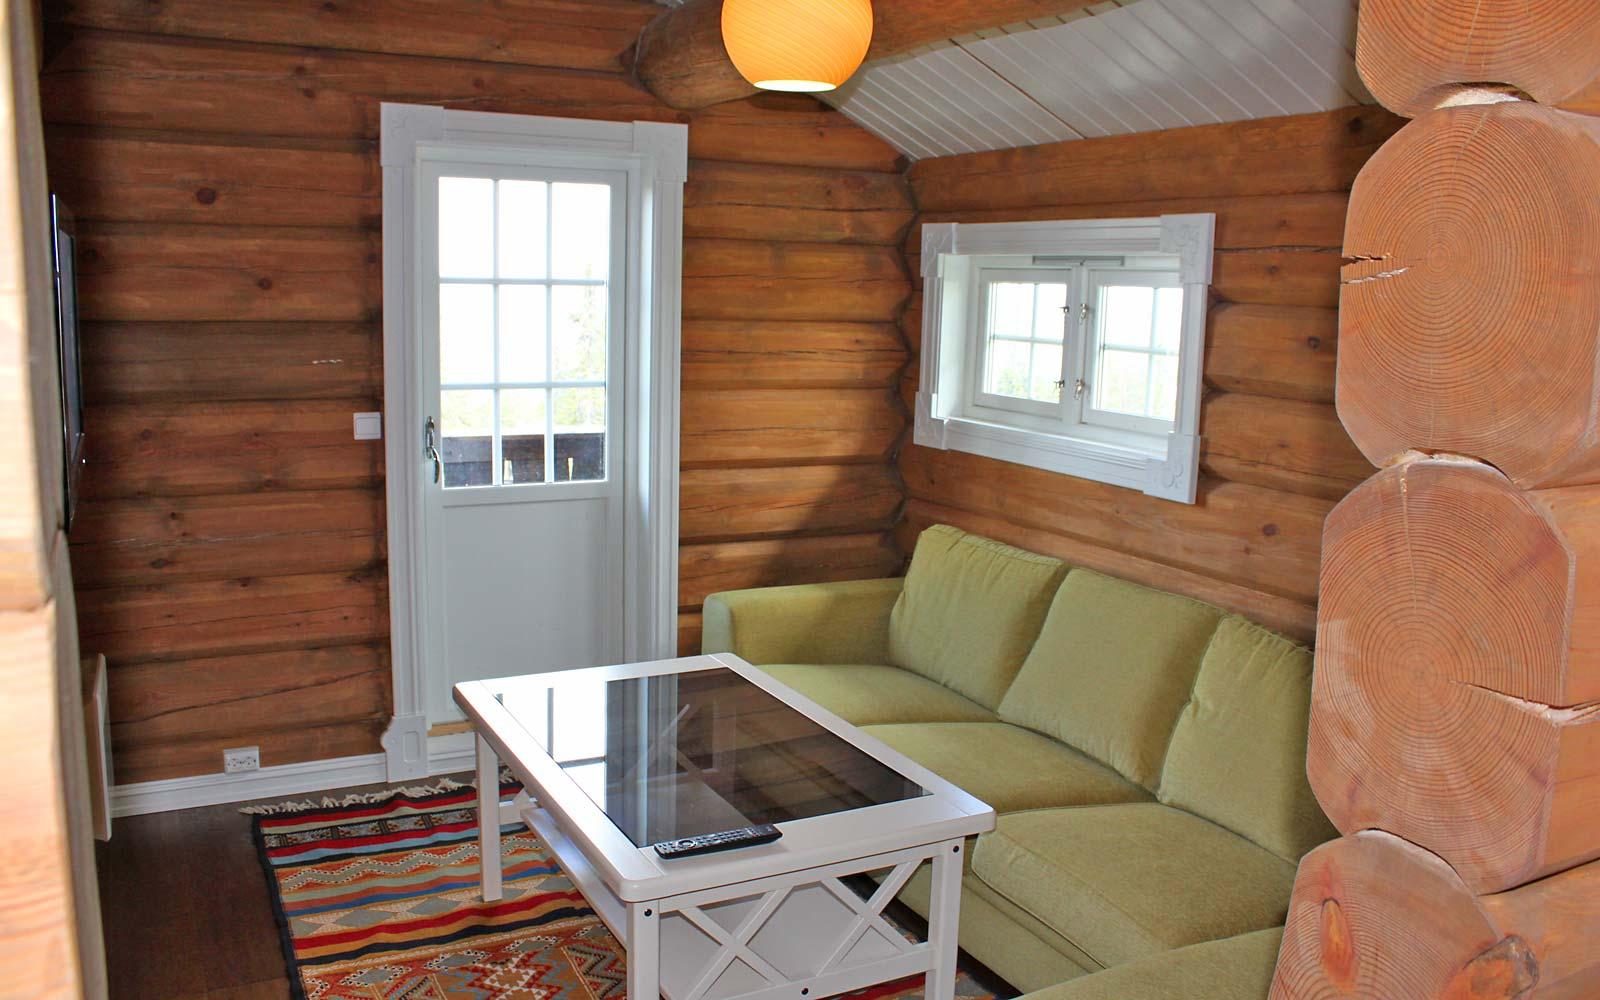 Loftstue hytte 829 - Sjumilskogen booking Trysil